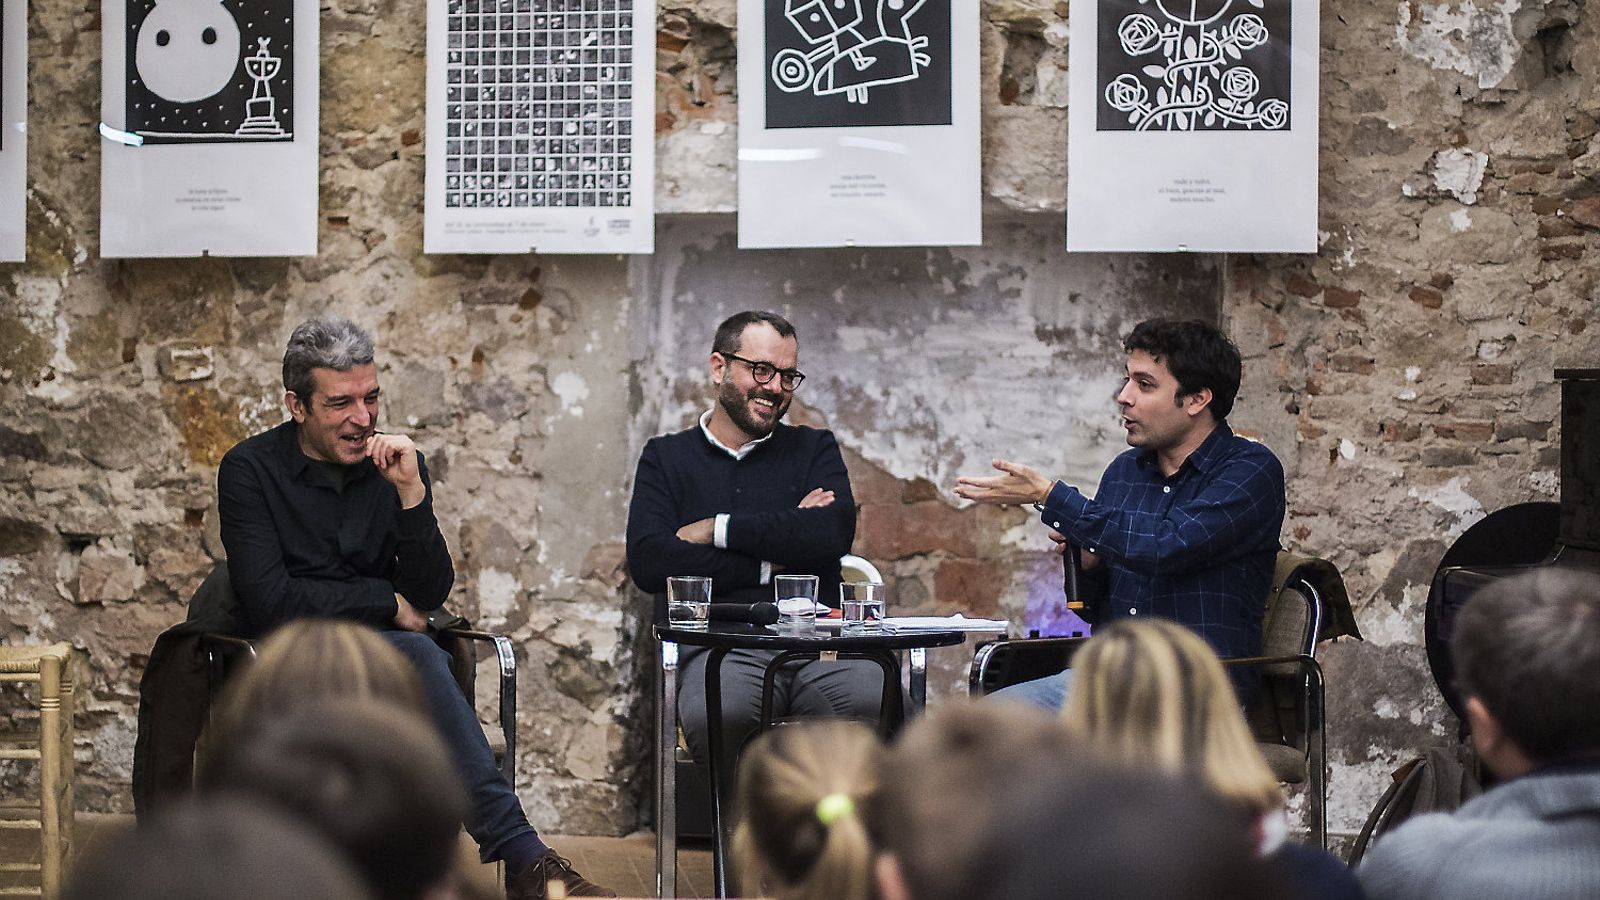 Antoni Ribas Tur, un poeta contra el domini de l'ego